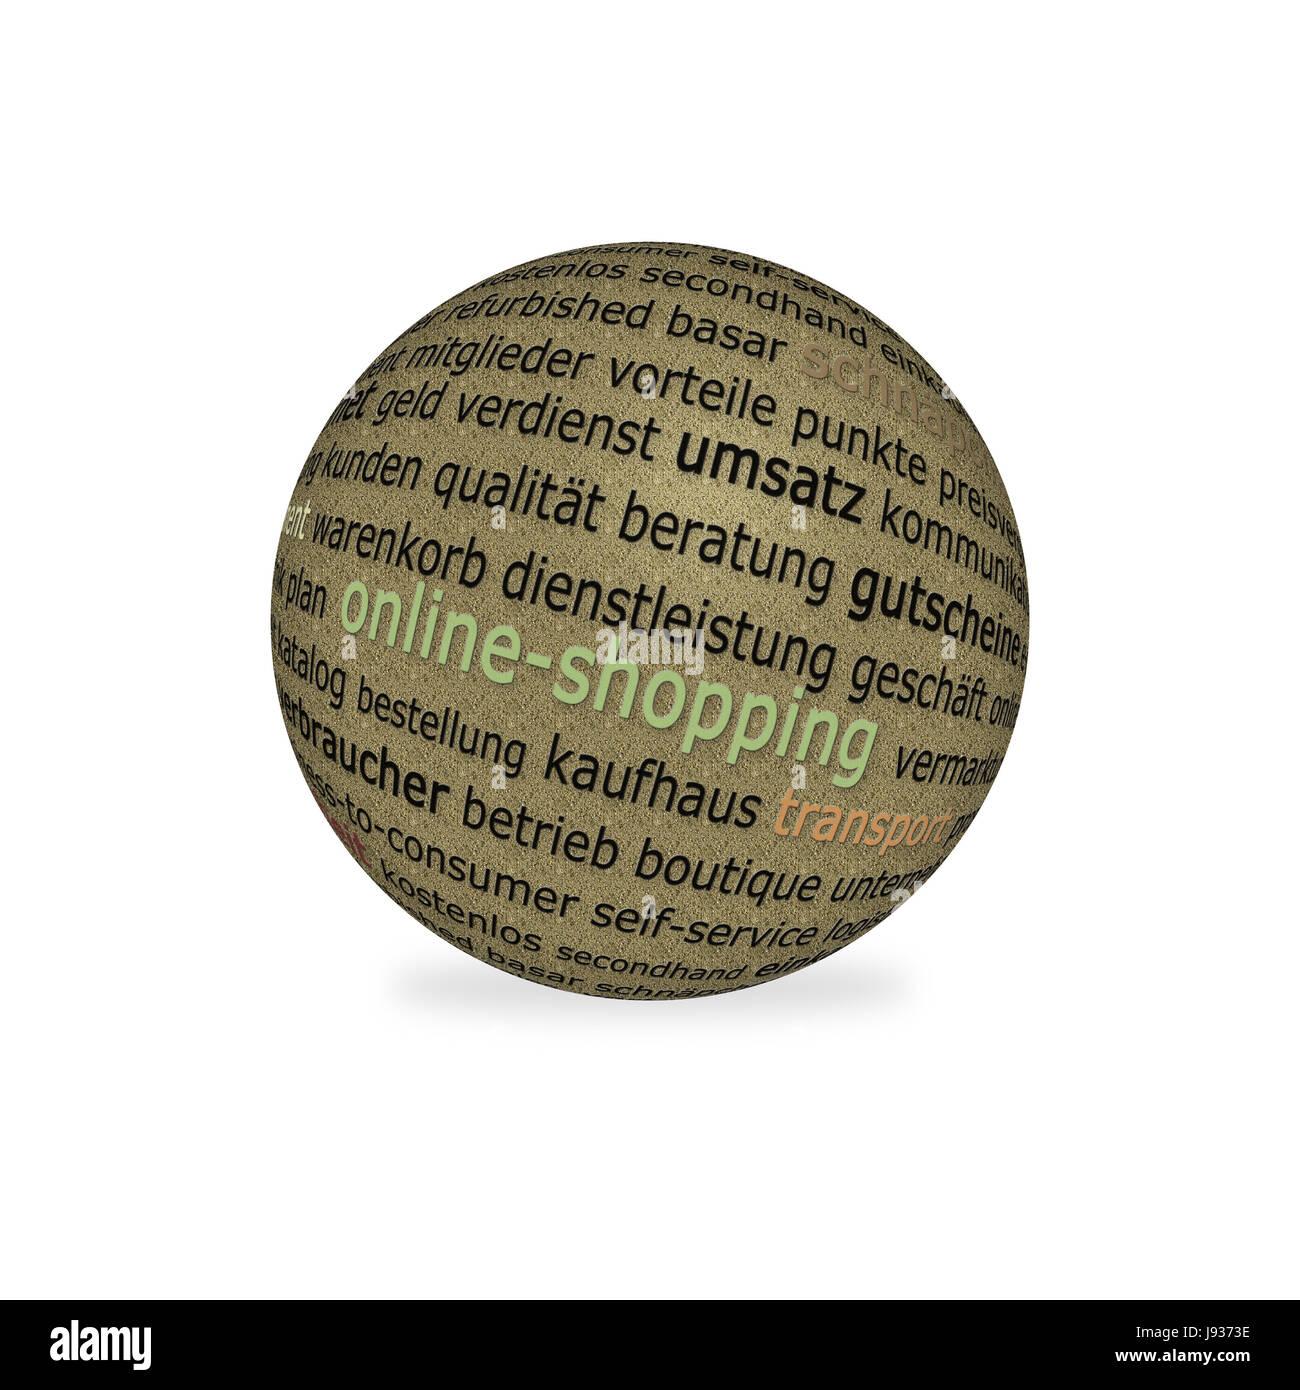 shopping ball - Stock Image